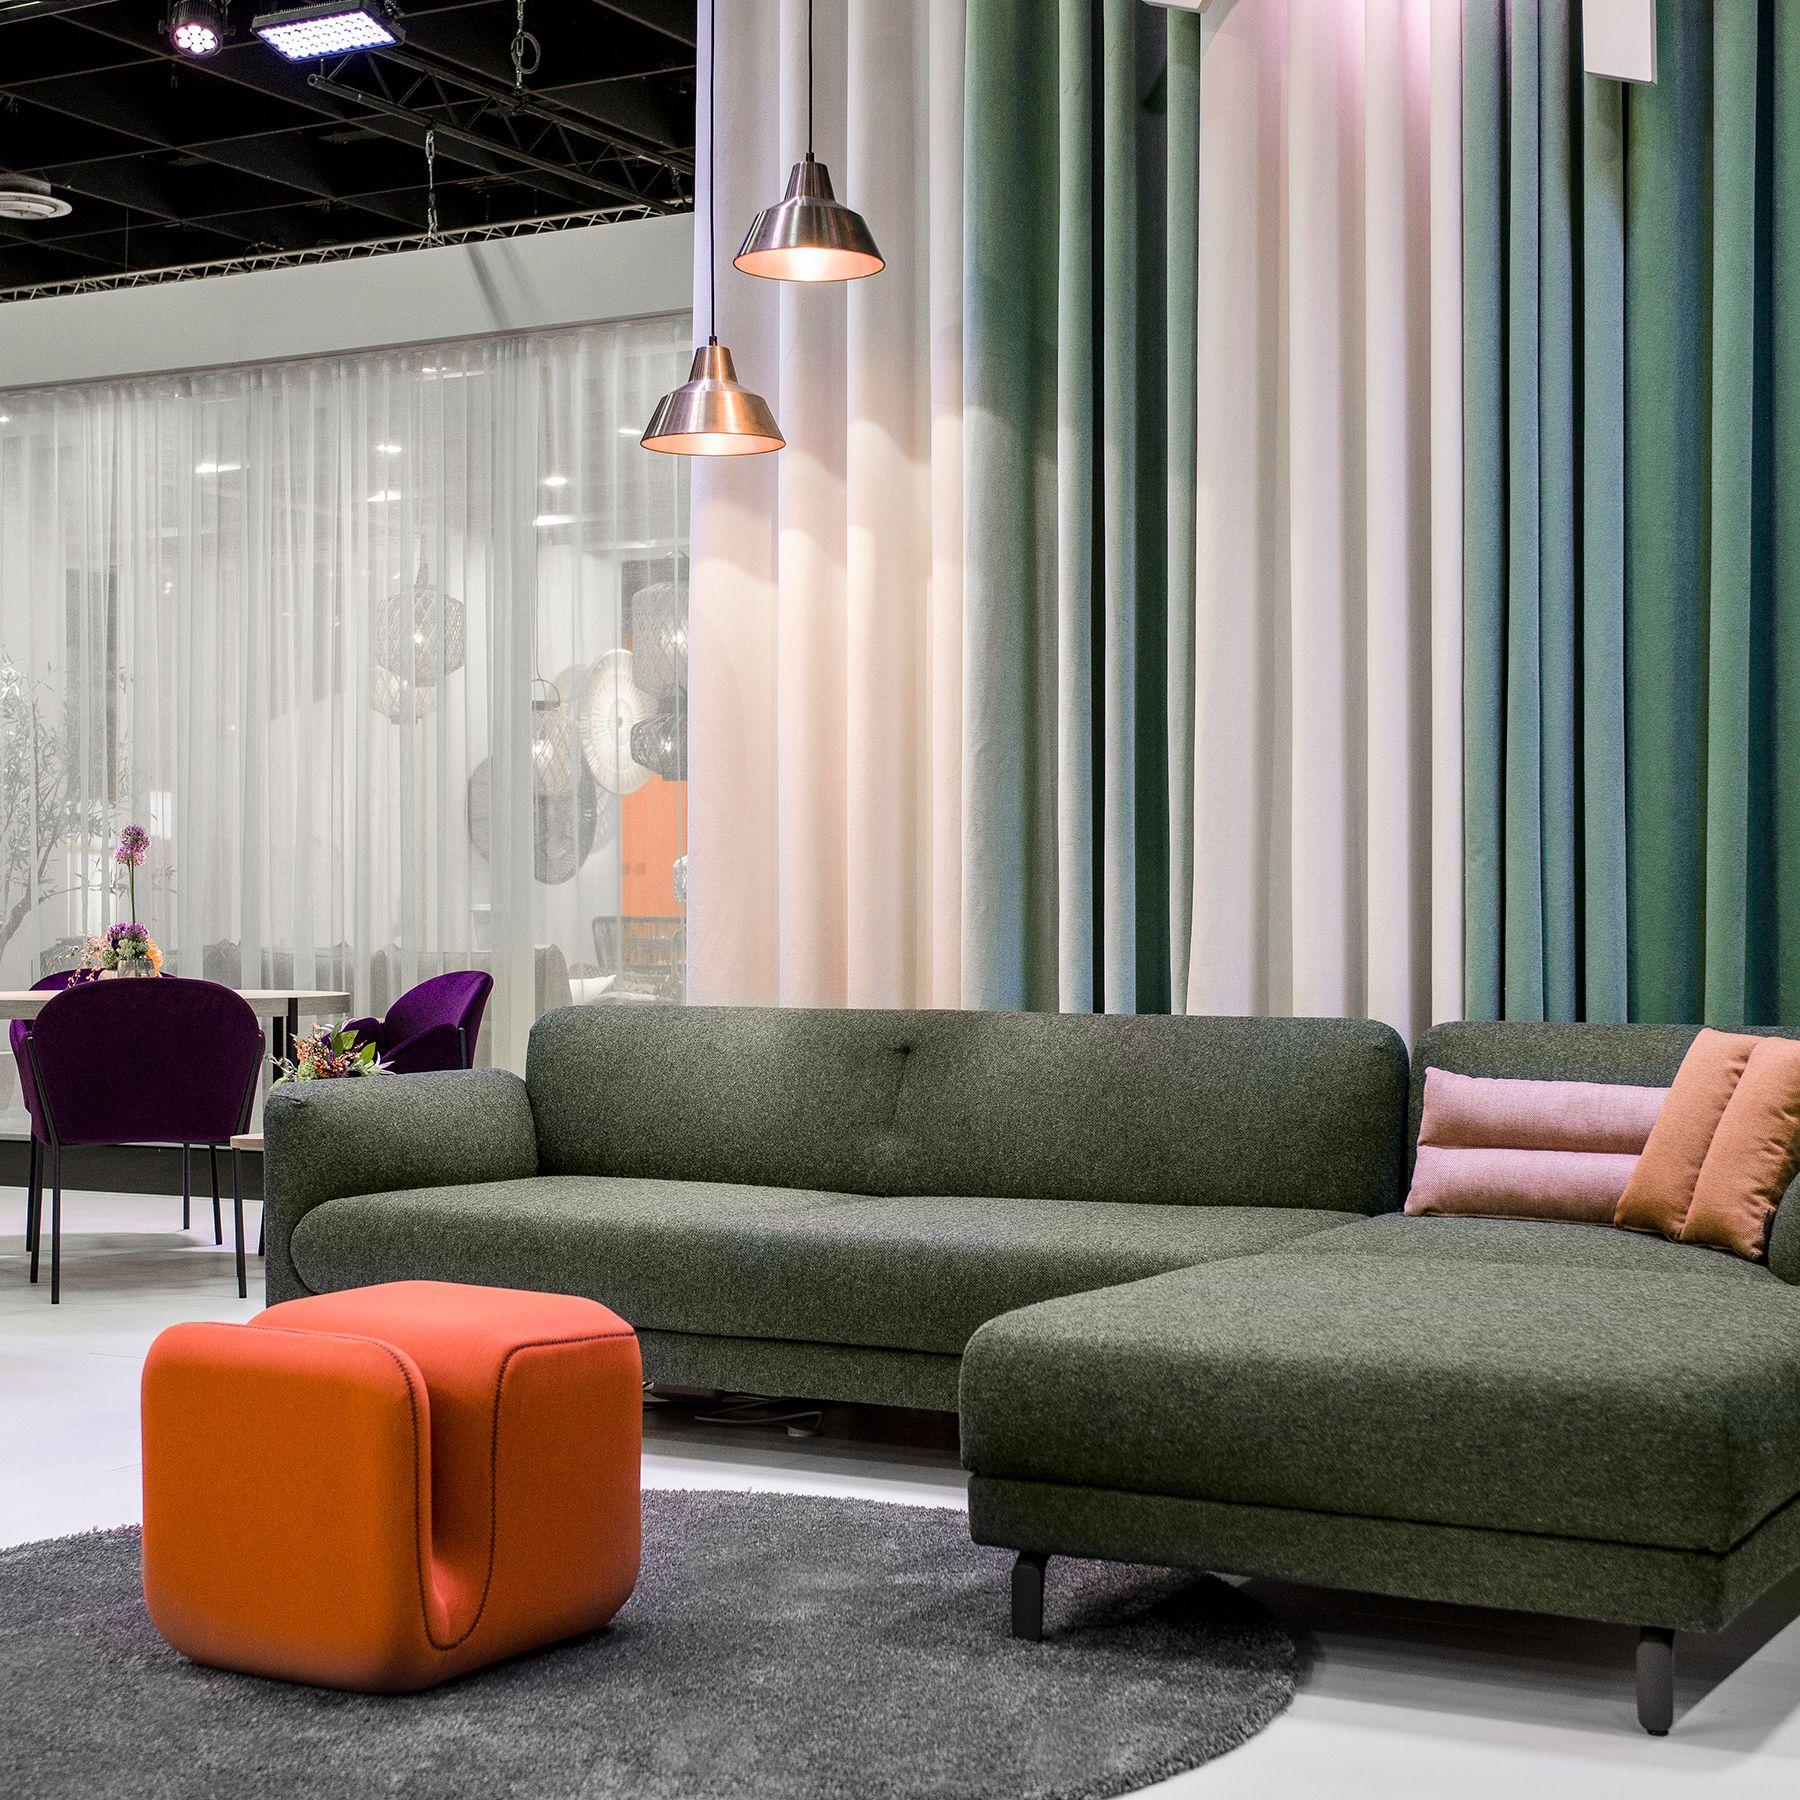 Design Bank Oranje.Artifort Novelties At The Imm 2019 Furniture Fair Figura 2018